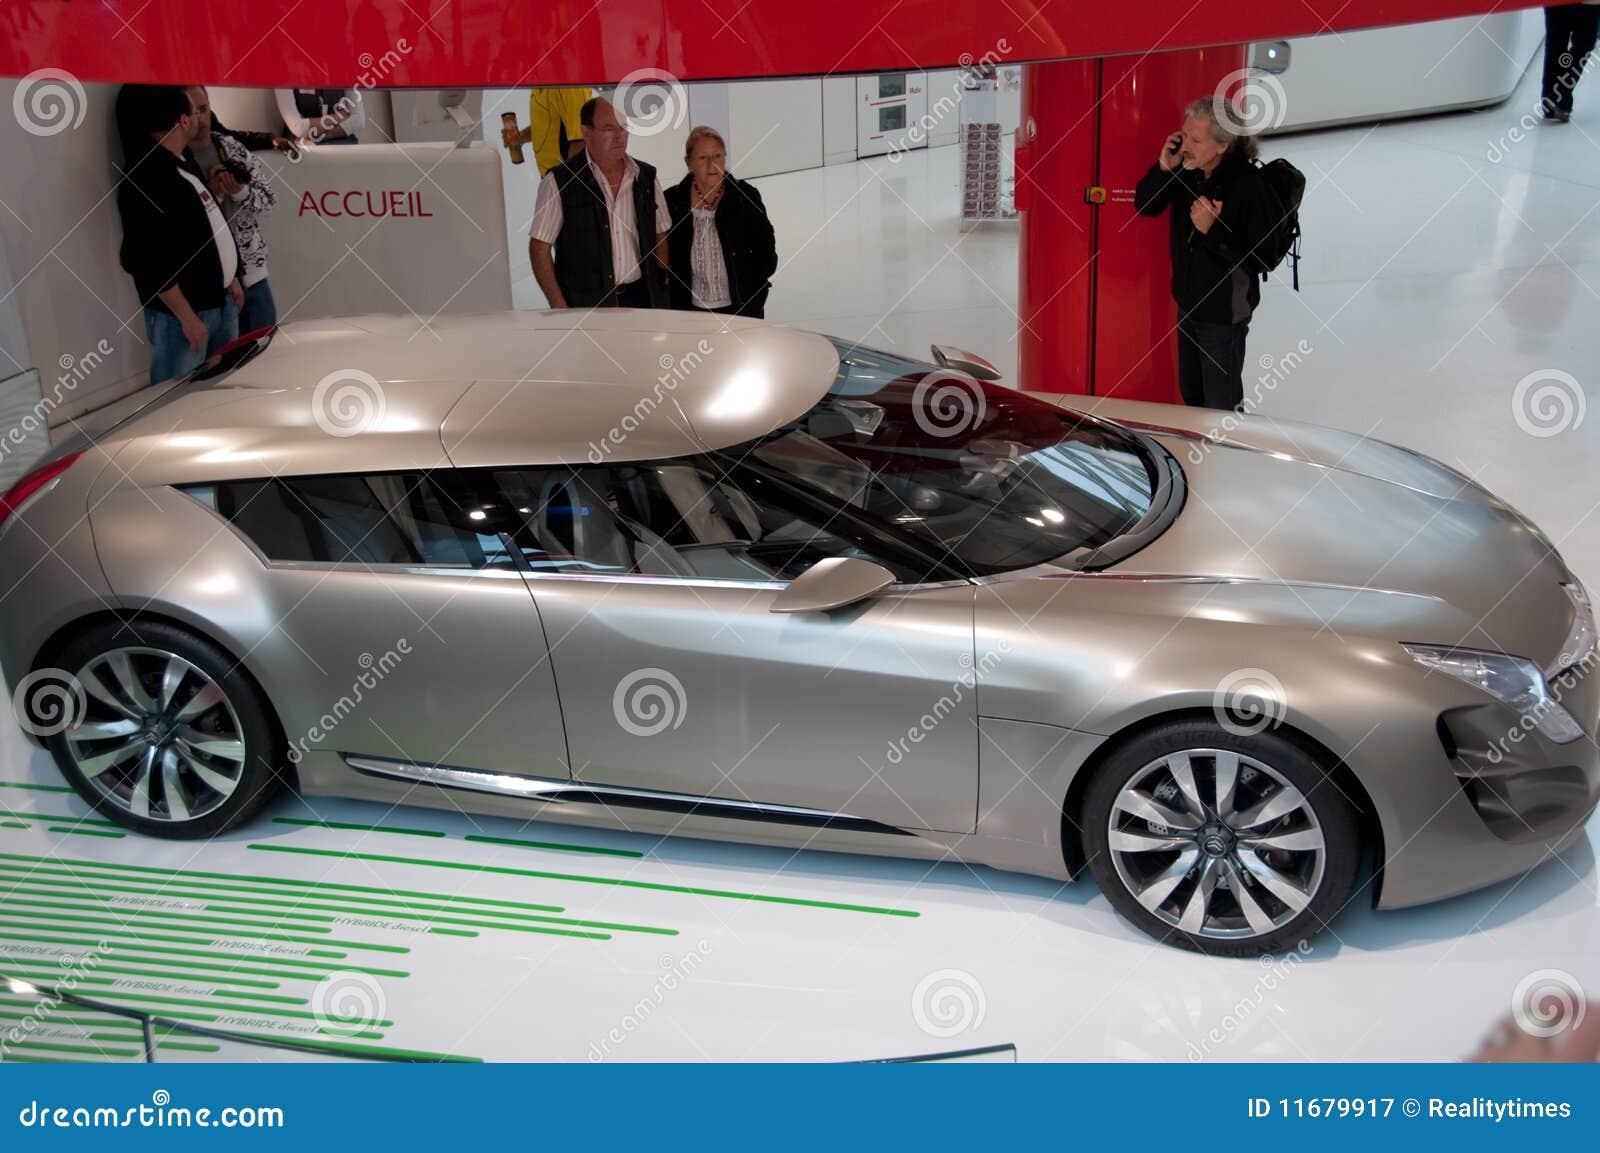 new car models citroen metisse paris showroom editorial photography image 11679917. Black Bedroom Furniture Sets. Home Design Ideas